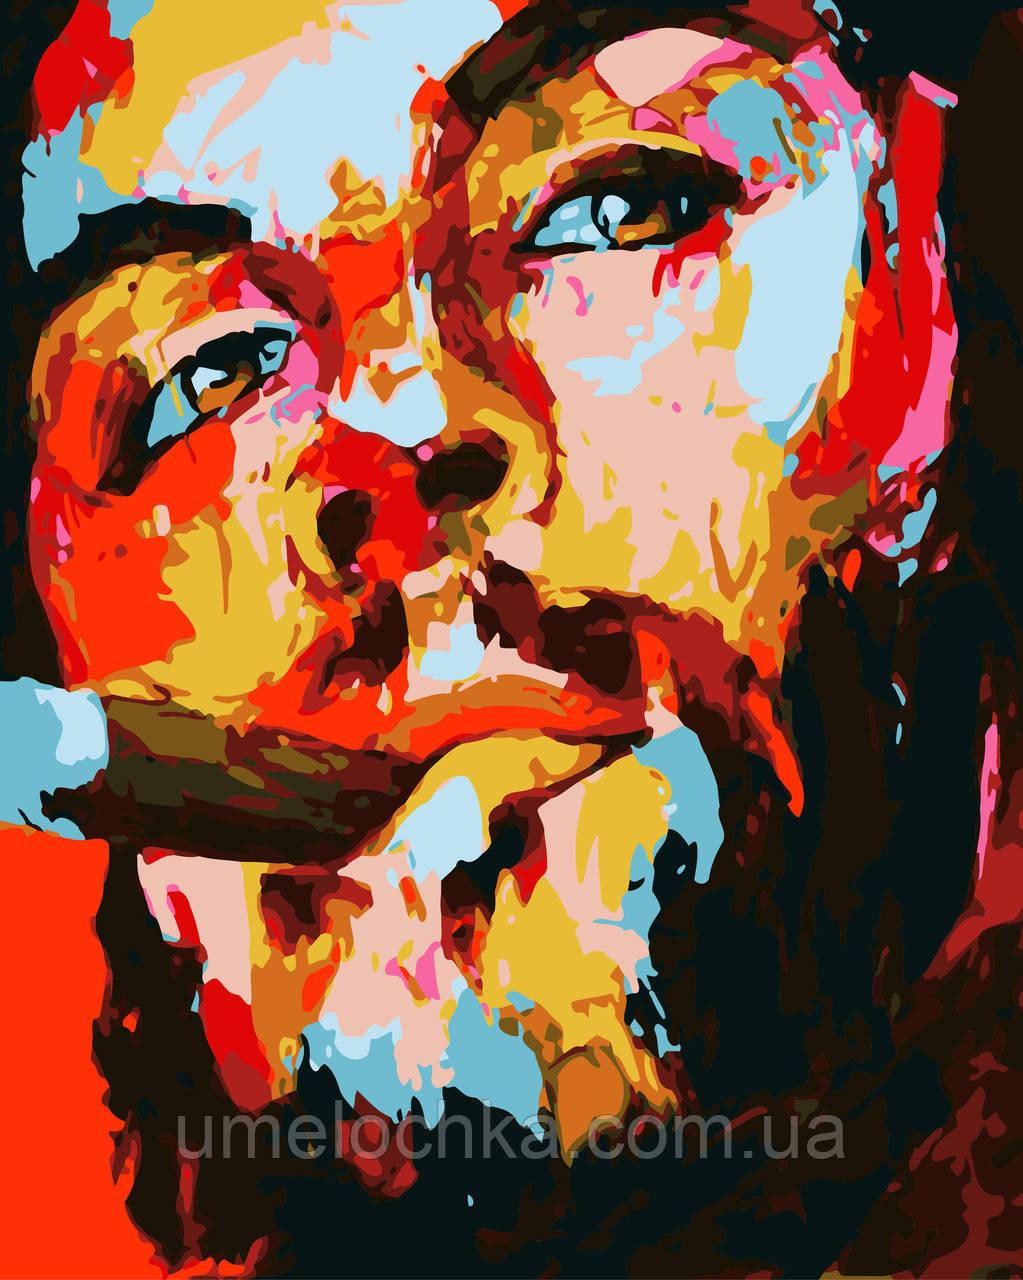 Картина по номерам Эрнесто Че Гевара Худ Франсуаза Нилли (BK-GX3140) 40 х 50 см